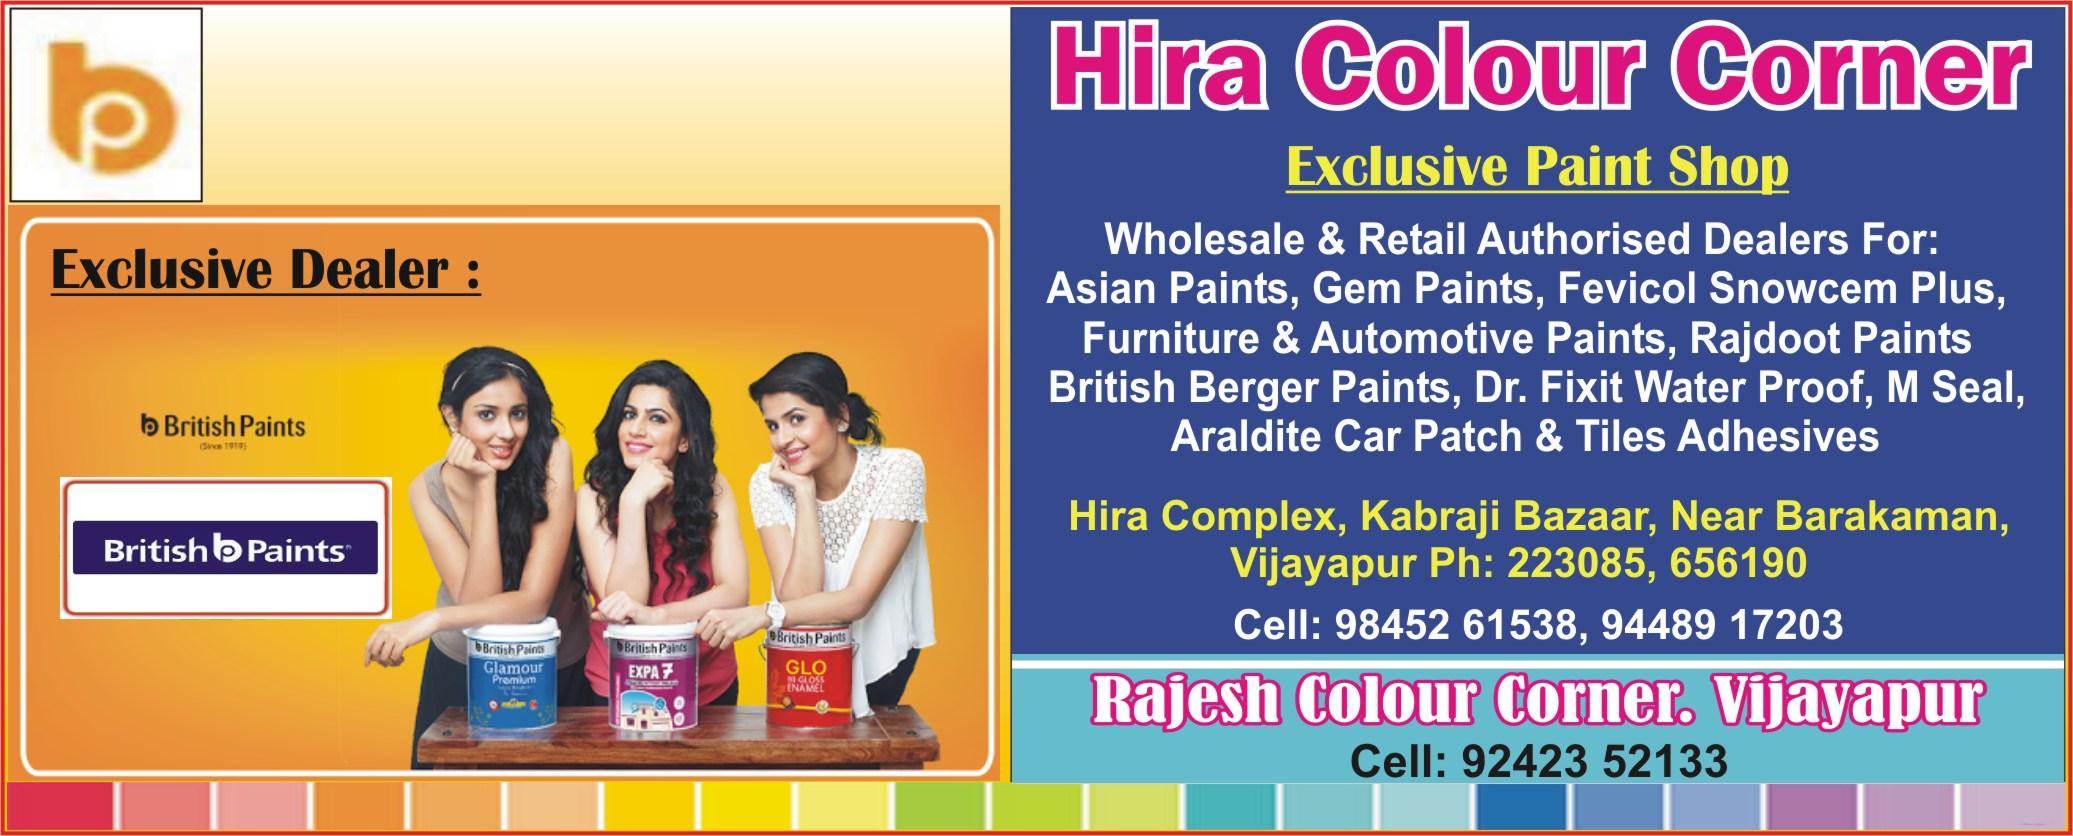 Hira Colour Corner